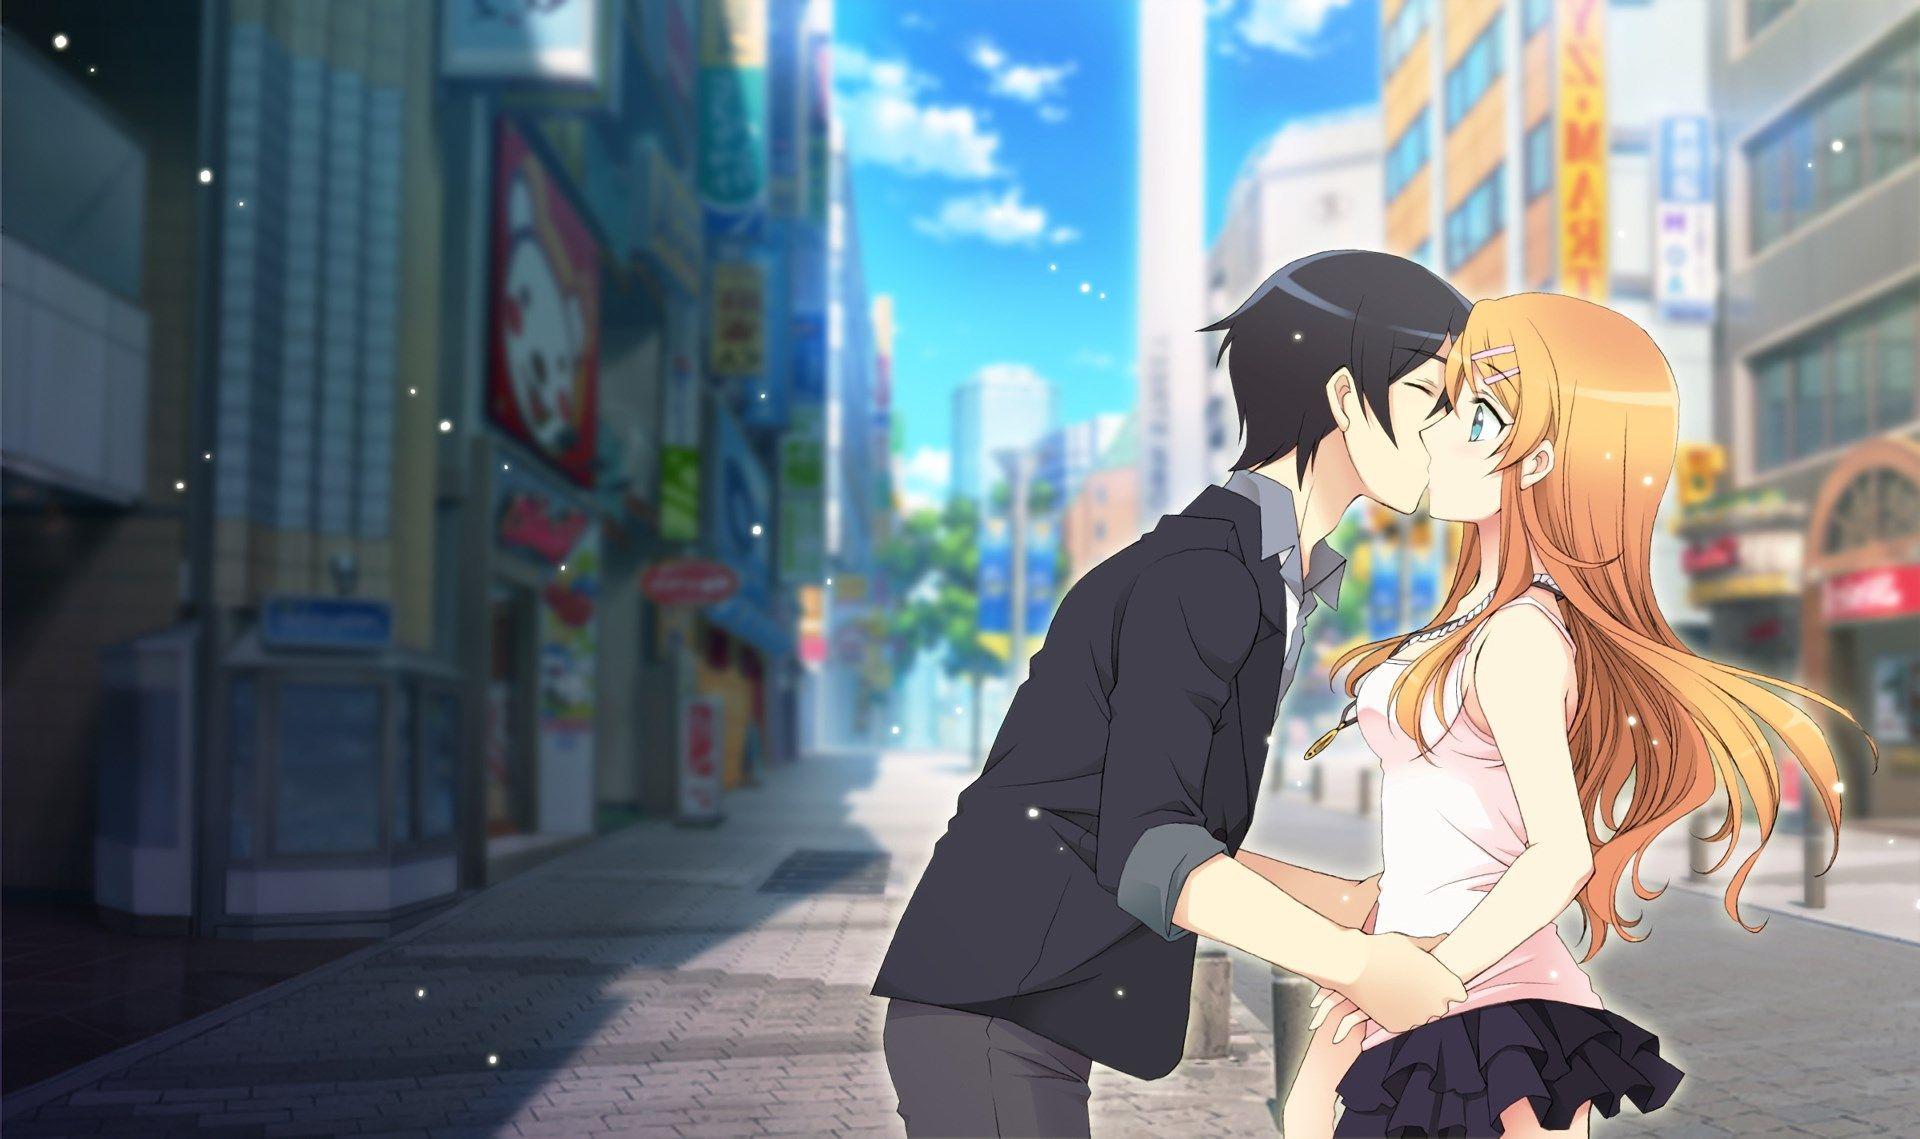 Wallpaper for Desktop: oreimo   Manga love, Anime life, Anime